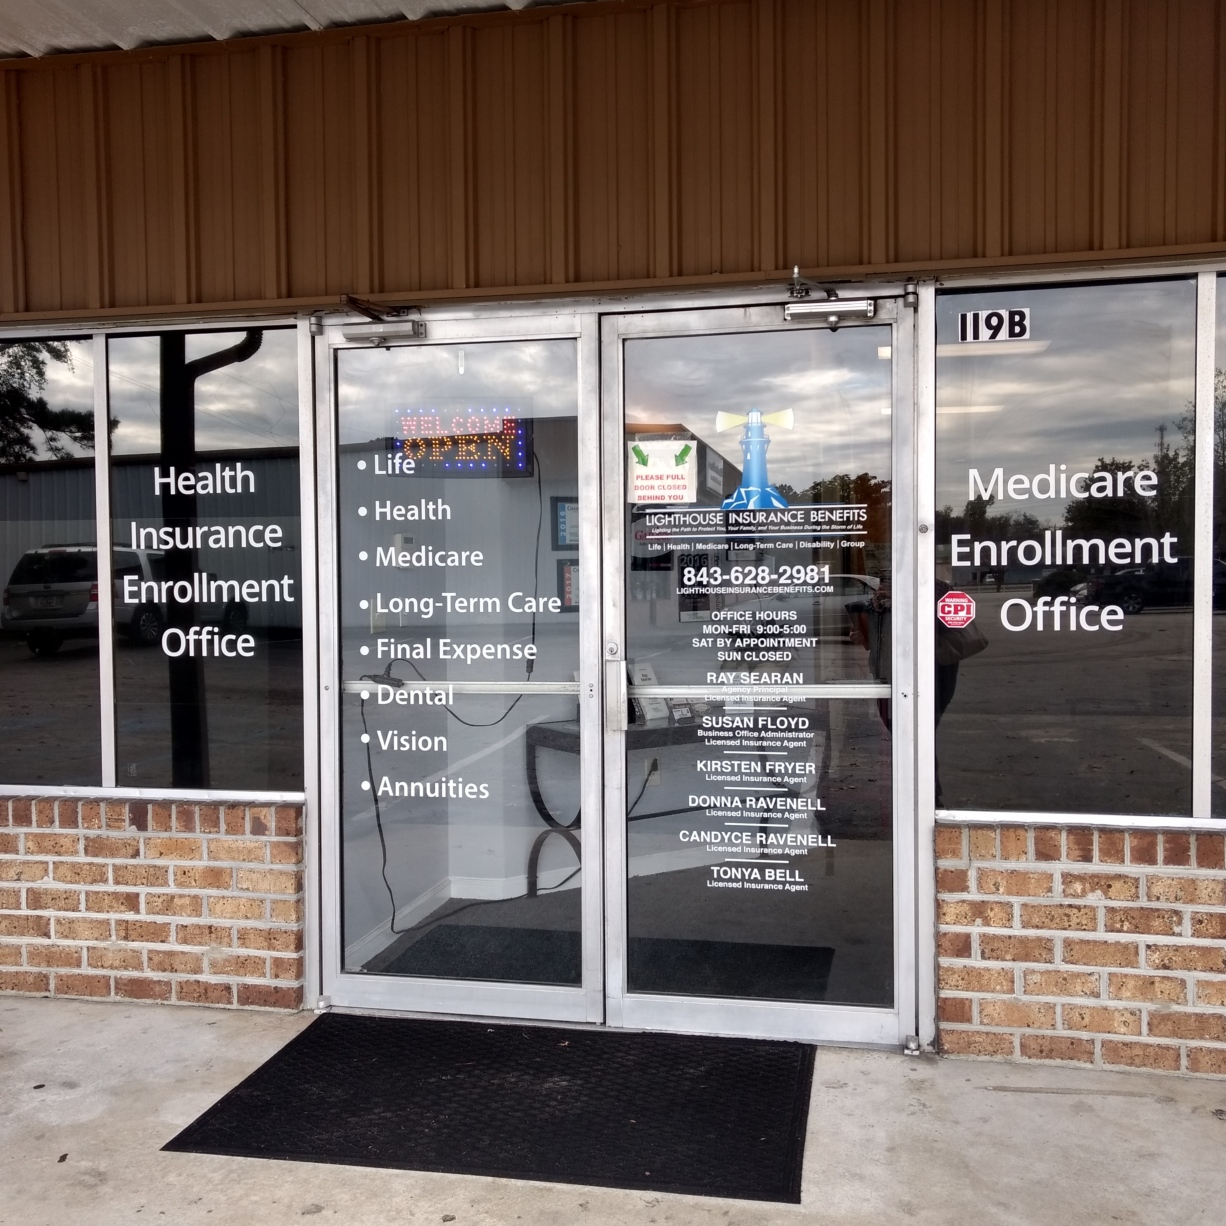 Lighthouse Insurance Benefits | Charleston Insurance Agency image 1